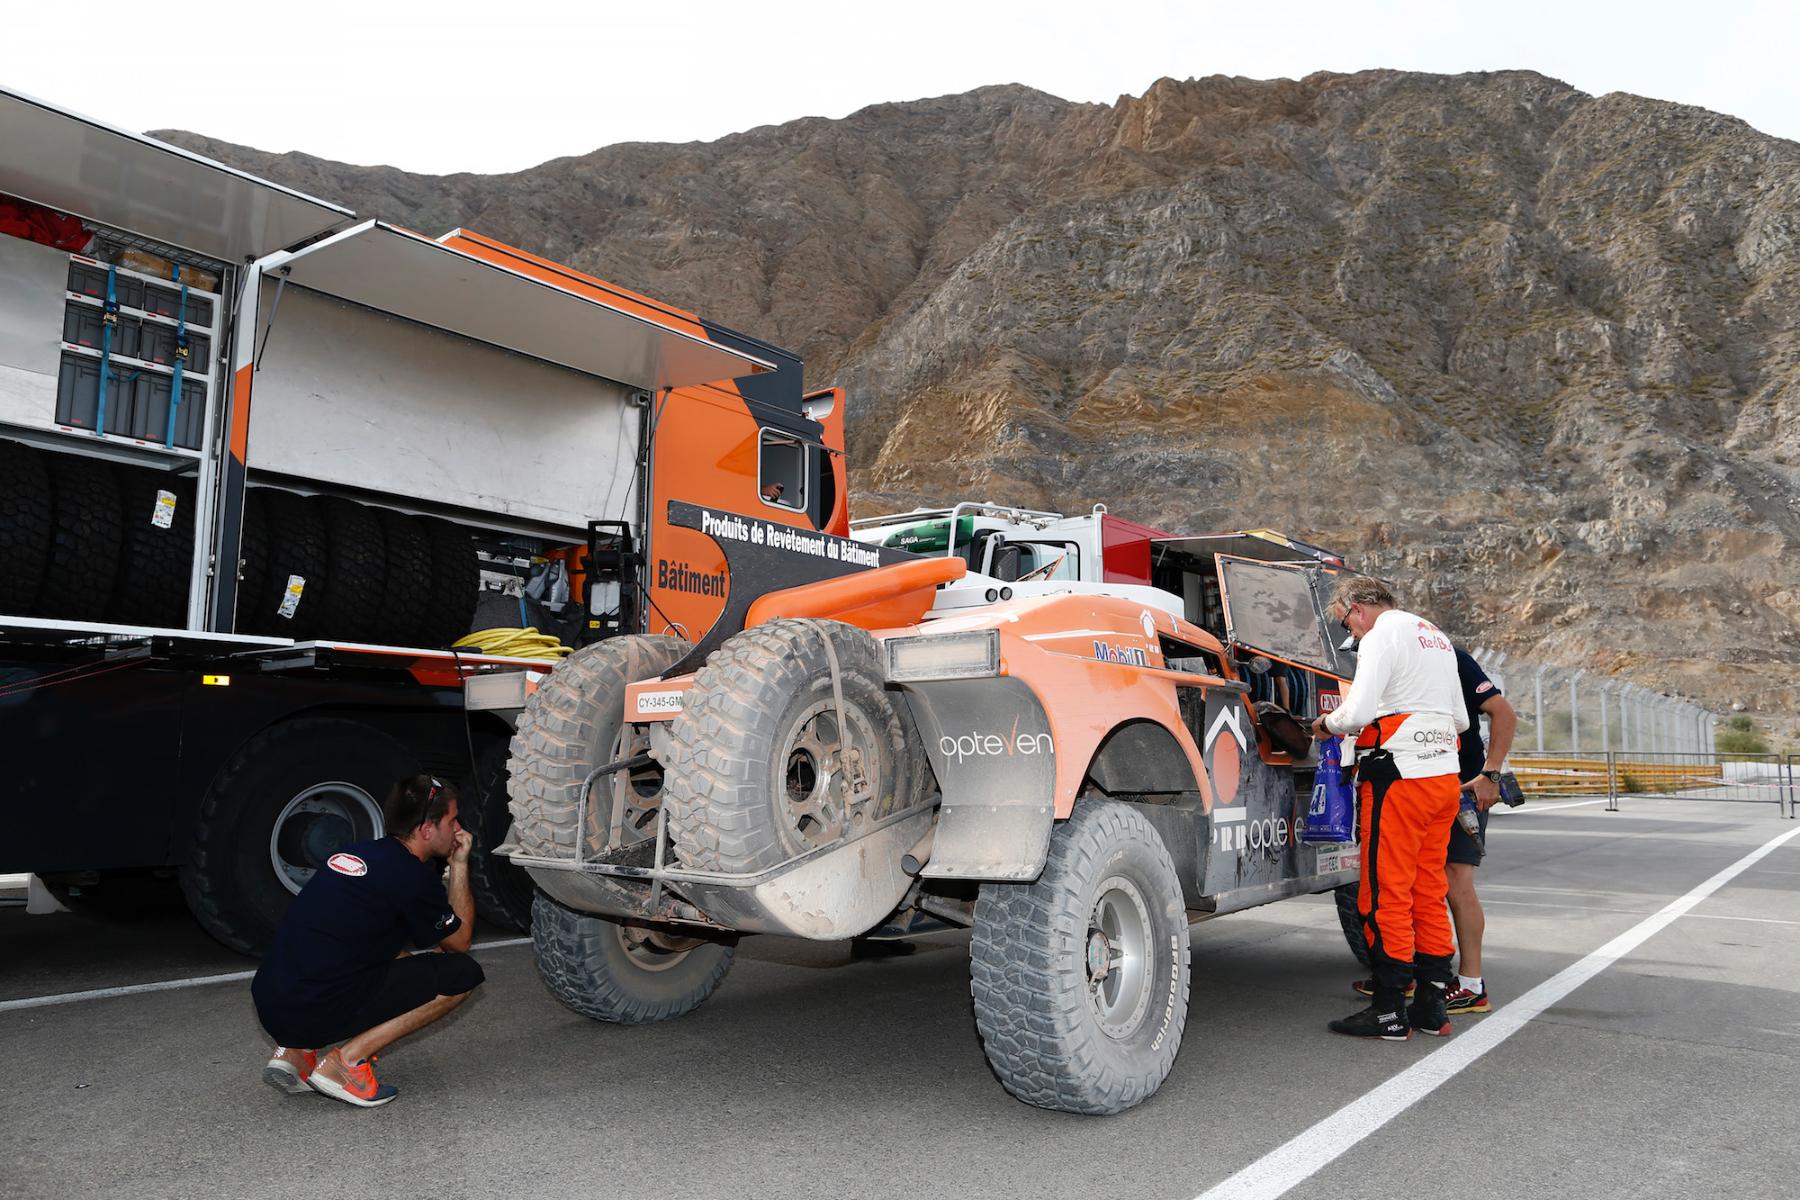 320 CHABOT Ronan (Fra) PILLOT Gilles (Fra) Smg action during the Dakar 2015 Argentina Bolivia Chile, Stage 2 / Etape 2 -  Villa Carlos Paz to San Juan on January 5th 2015 at Villa Carlos Paz, Argentina. Photo Florent Gooden / DPPI